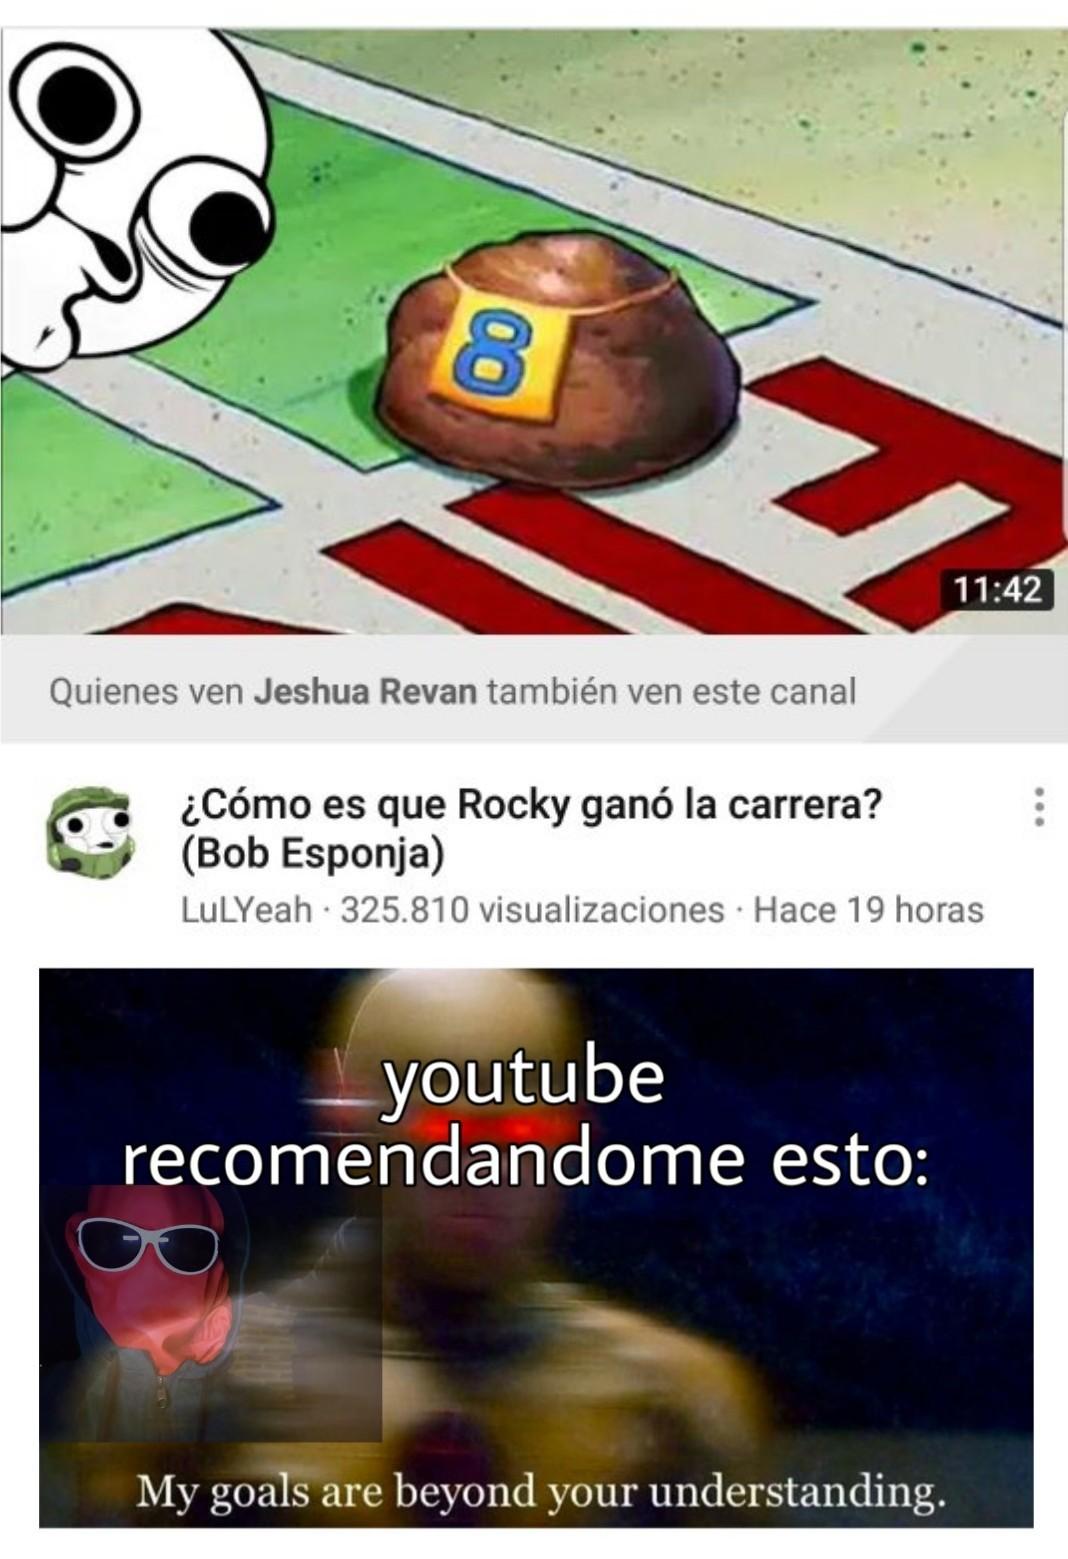 Porque youtube recomienda weas tan raras - meme